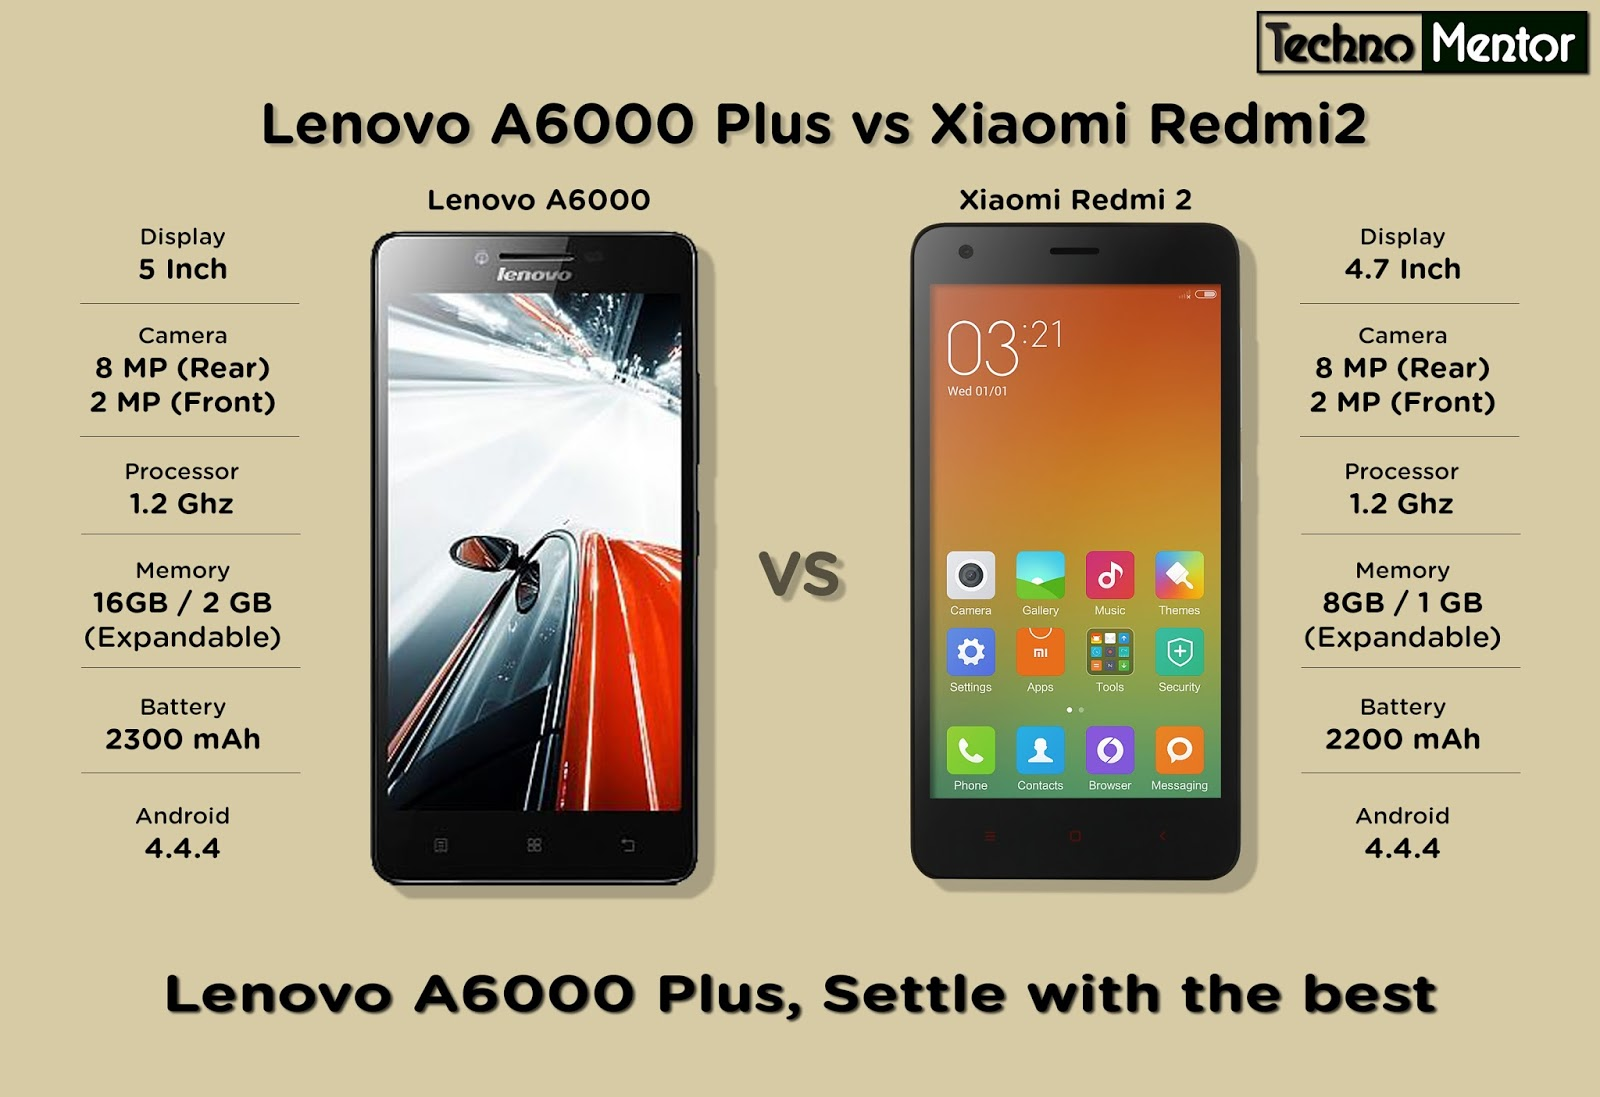 promo code bbe90 97985 The Techno Mentor: Lenovo A6000 Plus Surpasses Xiaomi Redmi 2